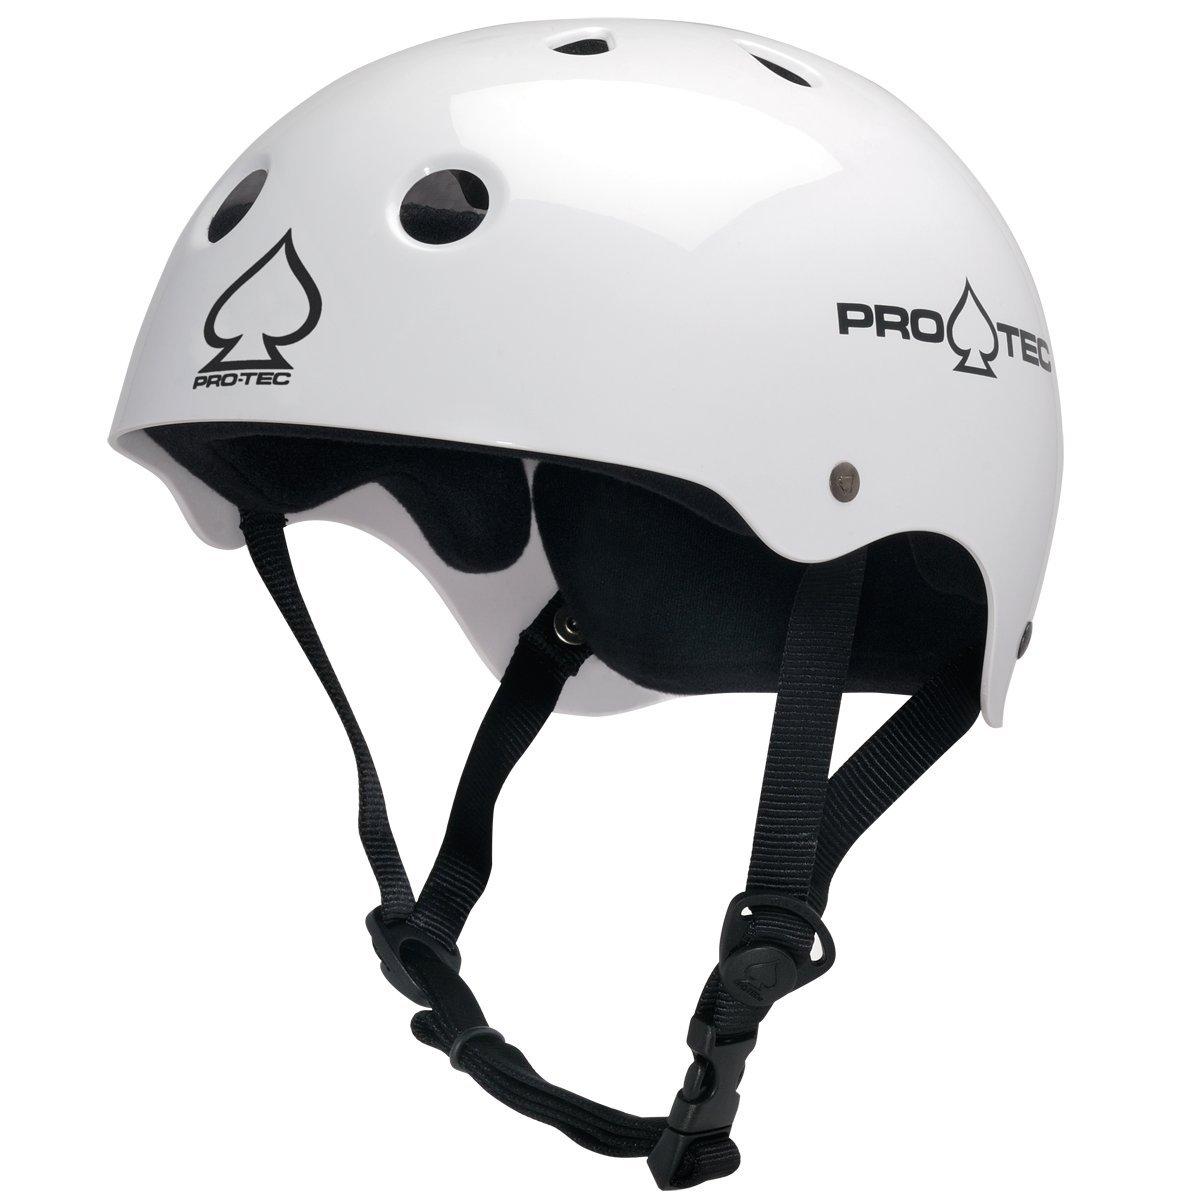 Pro Tec - Classic - Casque de vélo - Mixte Adulte Pro-Tec 1158097185